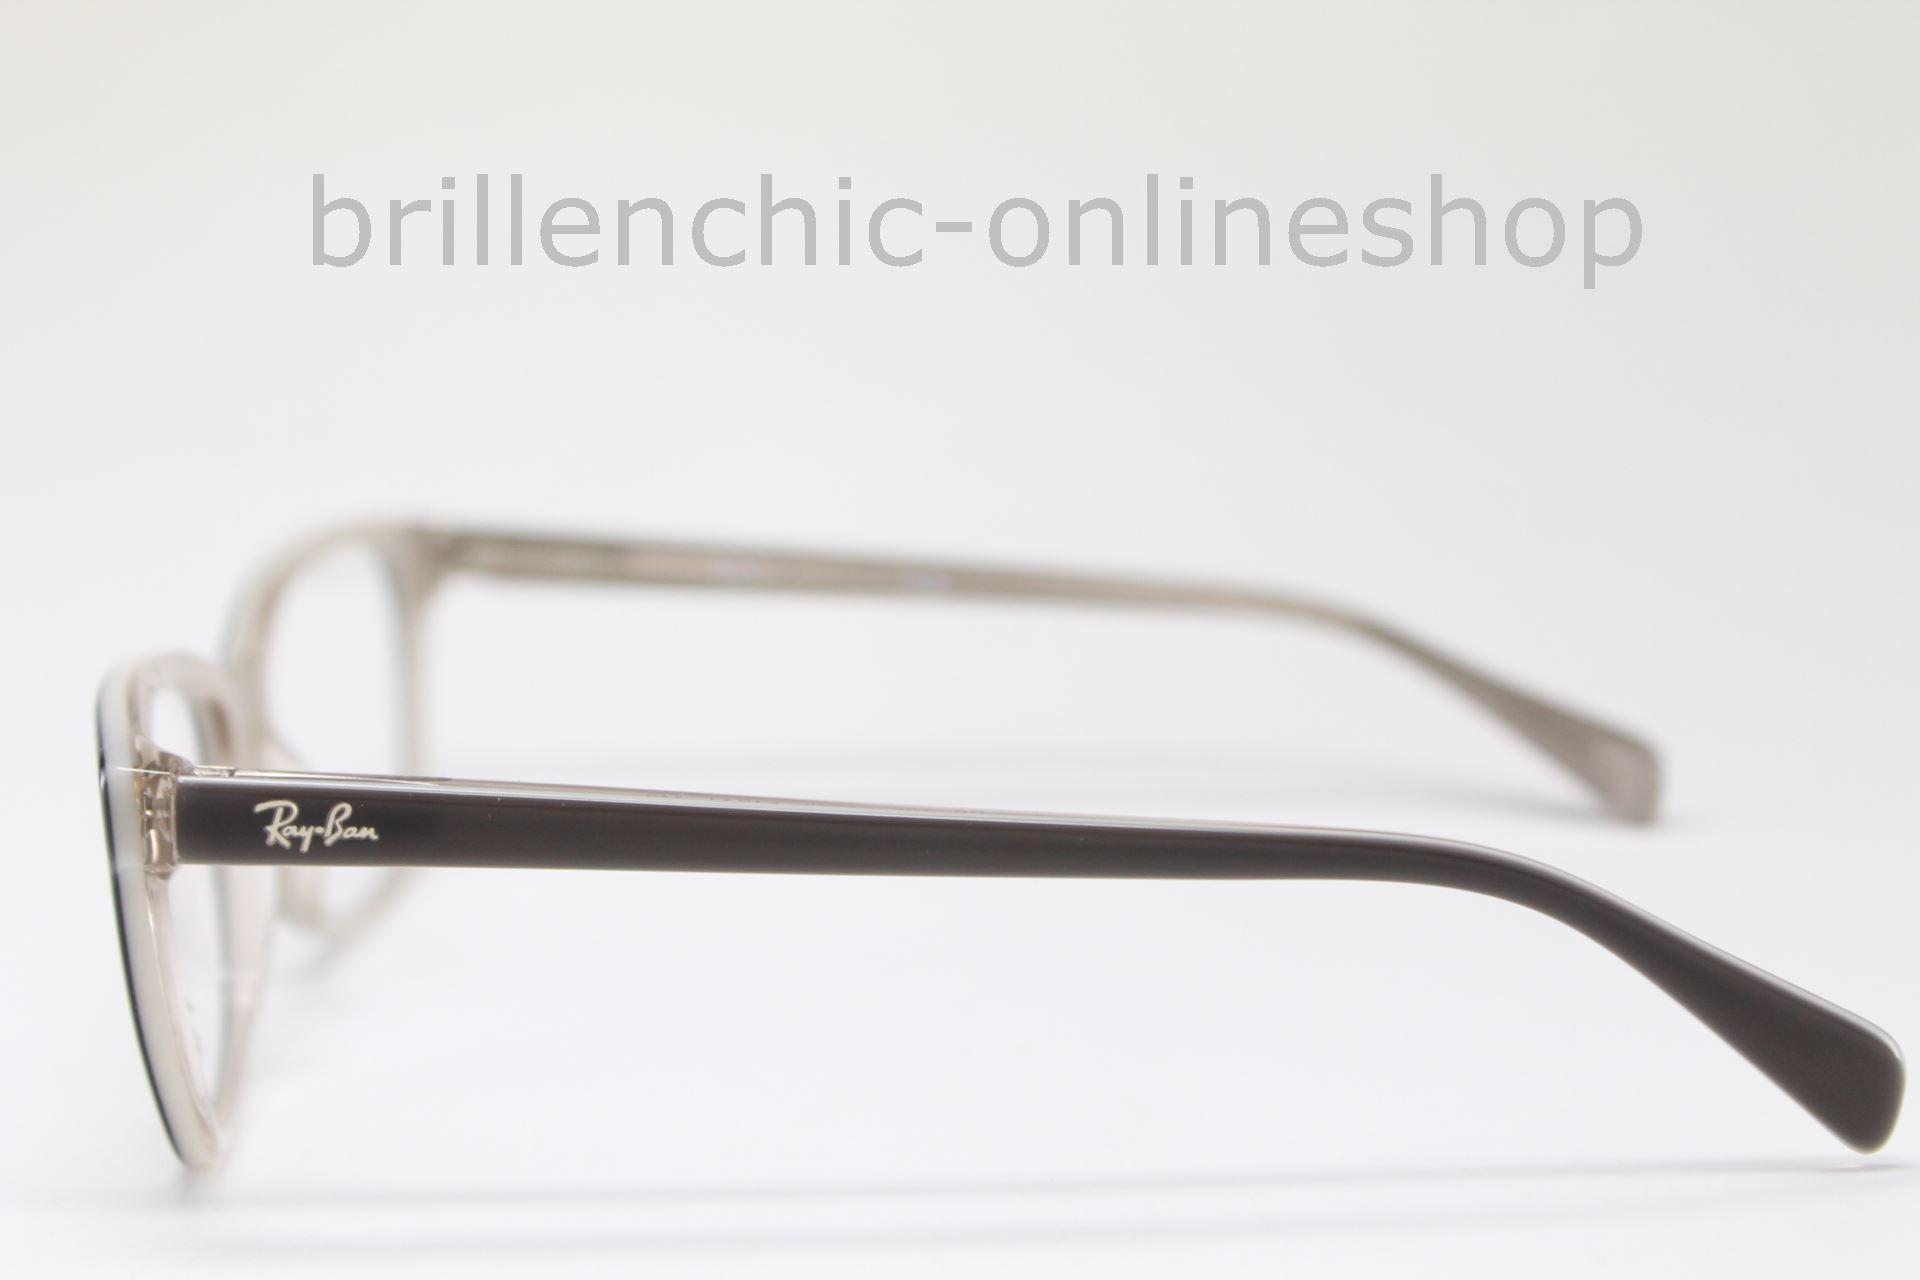 1ecddb3997 Brillenchic-onlineshop in Berlin - Ray Ban RB 5362 5778